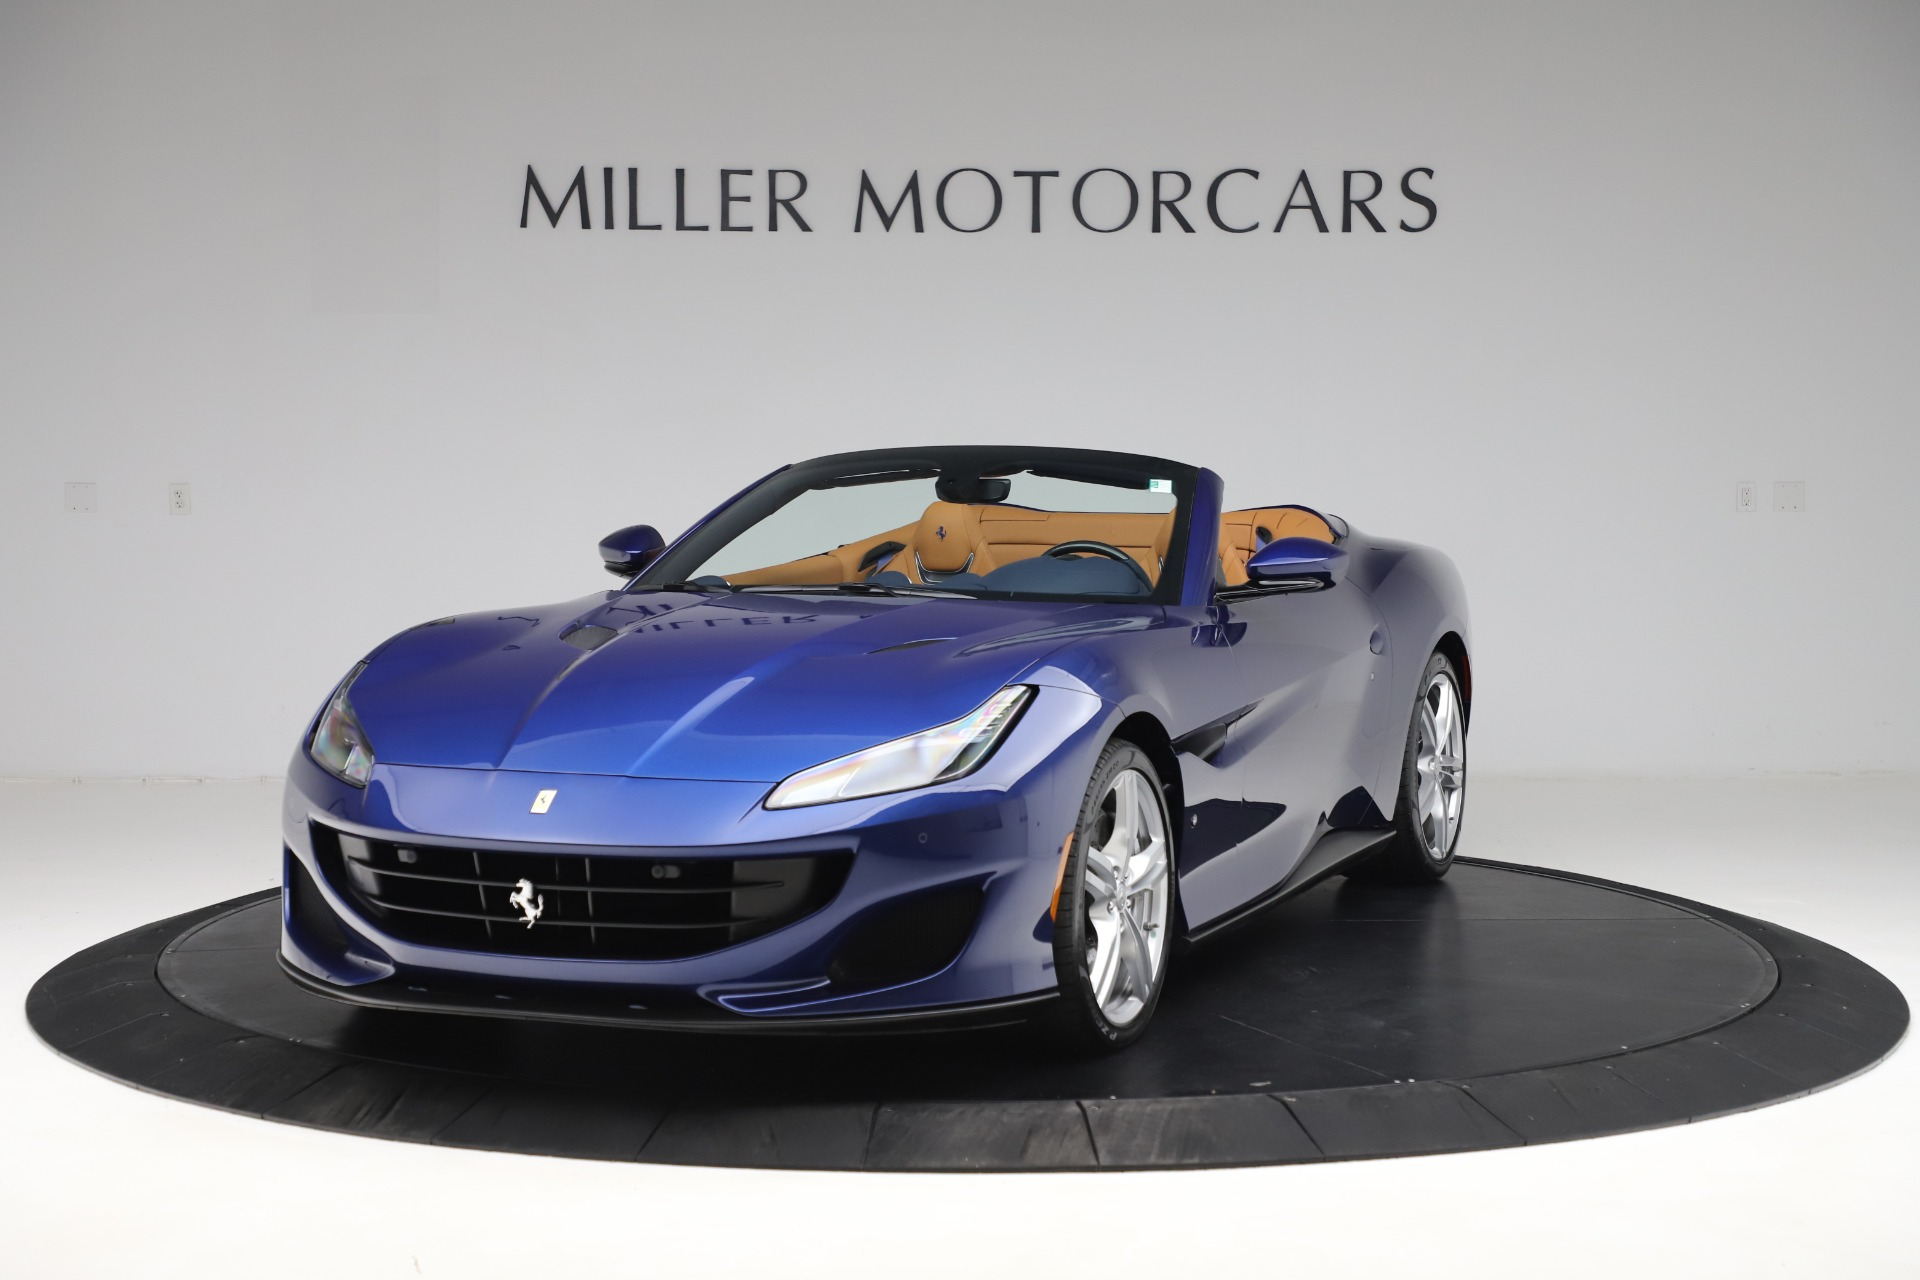 Used 2019 Ferrari Portofino for sale $234,900 at Alfa Romeo of Westport in Westport CT 06880 1